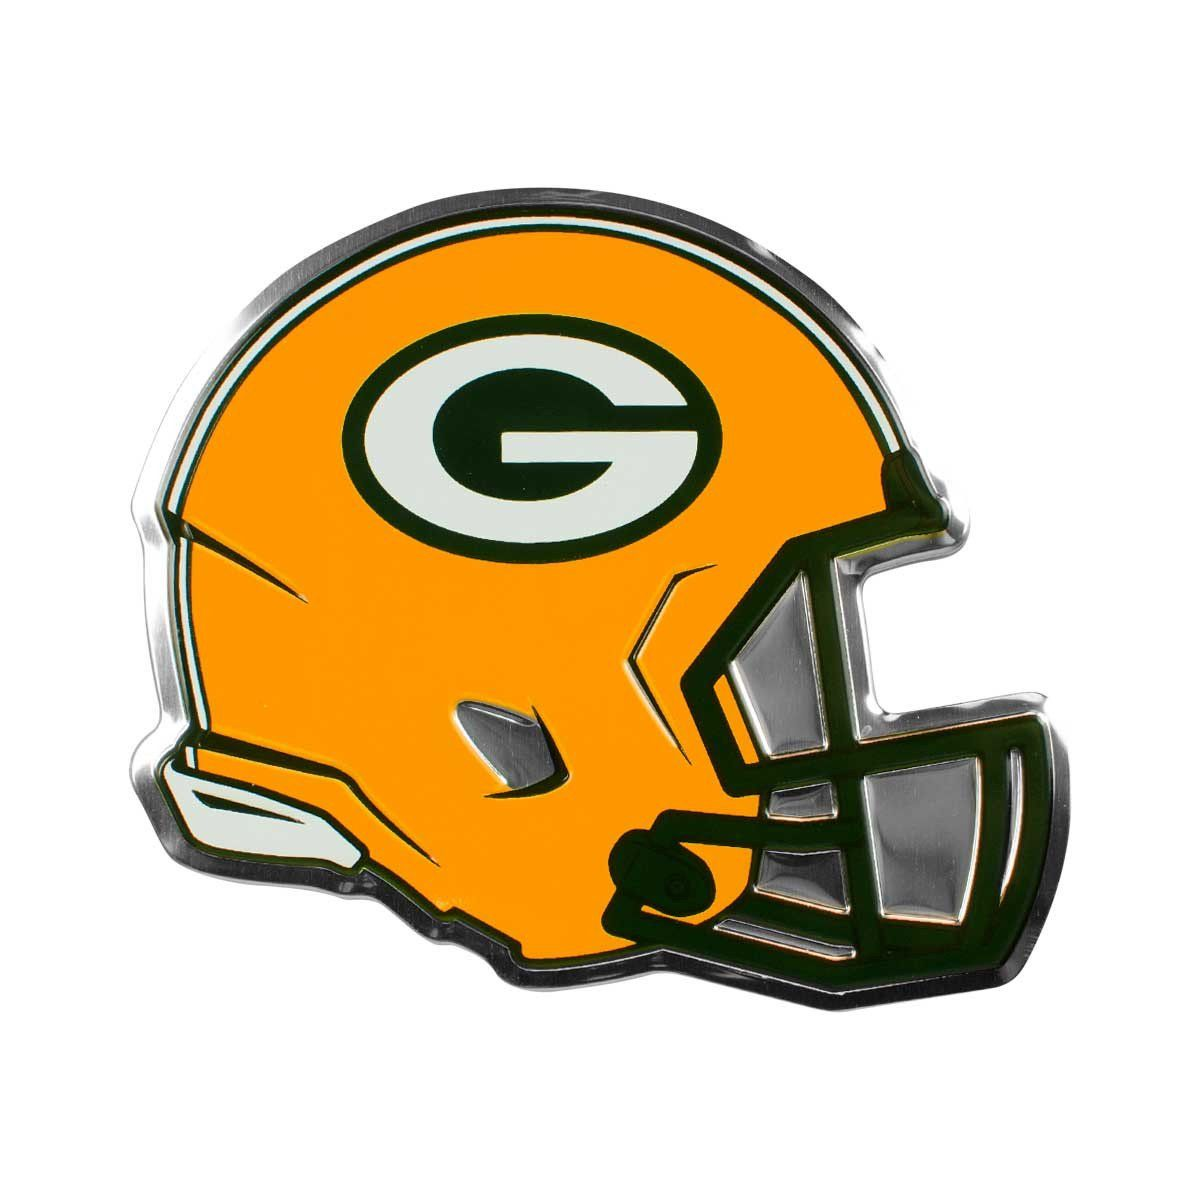 Green Bay Packers Helmet Auto Emblem Promark Green Bay Packers Helmet Nfl Packers Green Bay Packers